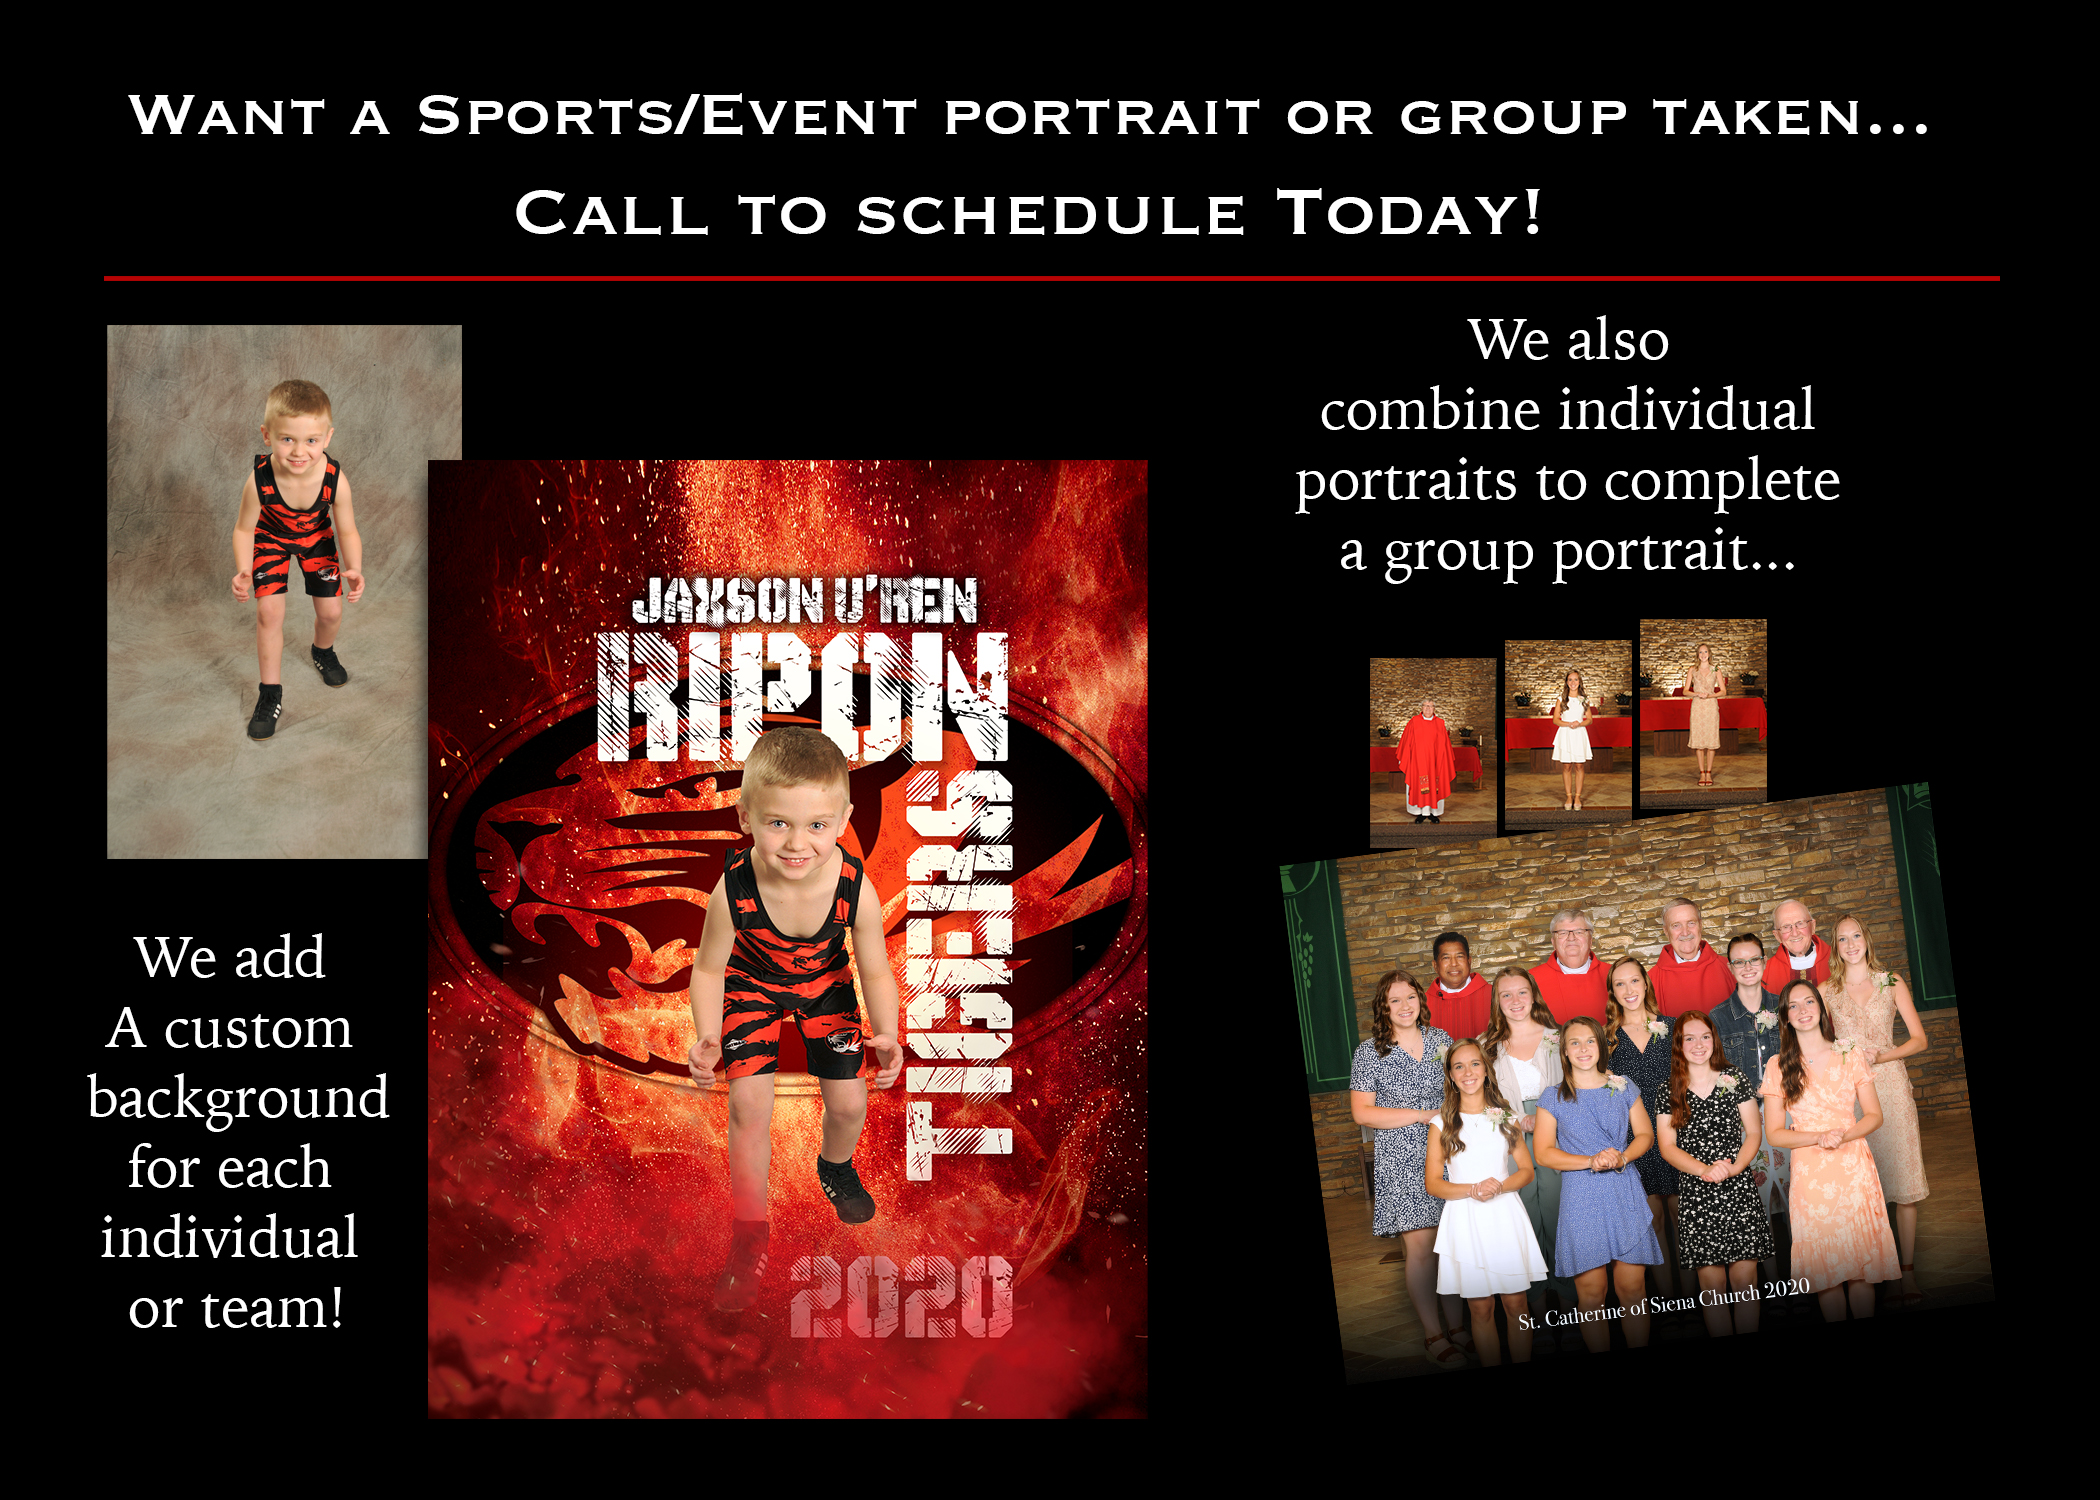 sport_Event_promo